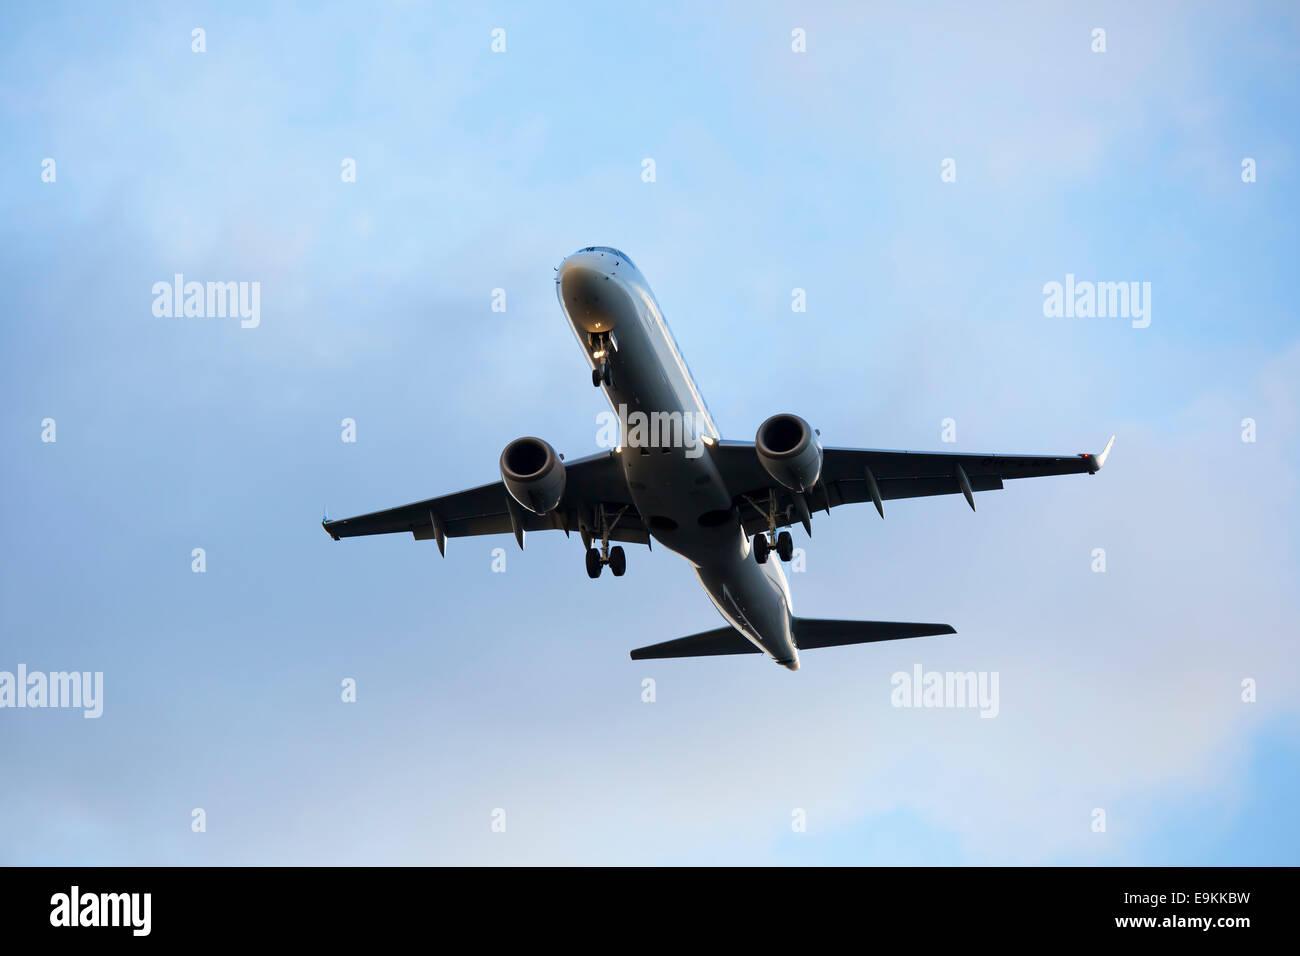 Embraer ERJ-190-LR (ERJ-190-100ER) OH-LFK Finnair on approach to land at Manchester Airport - Stock Image